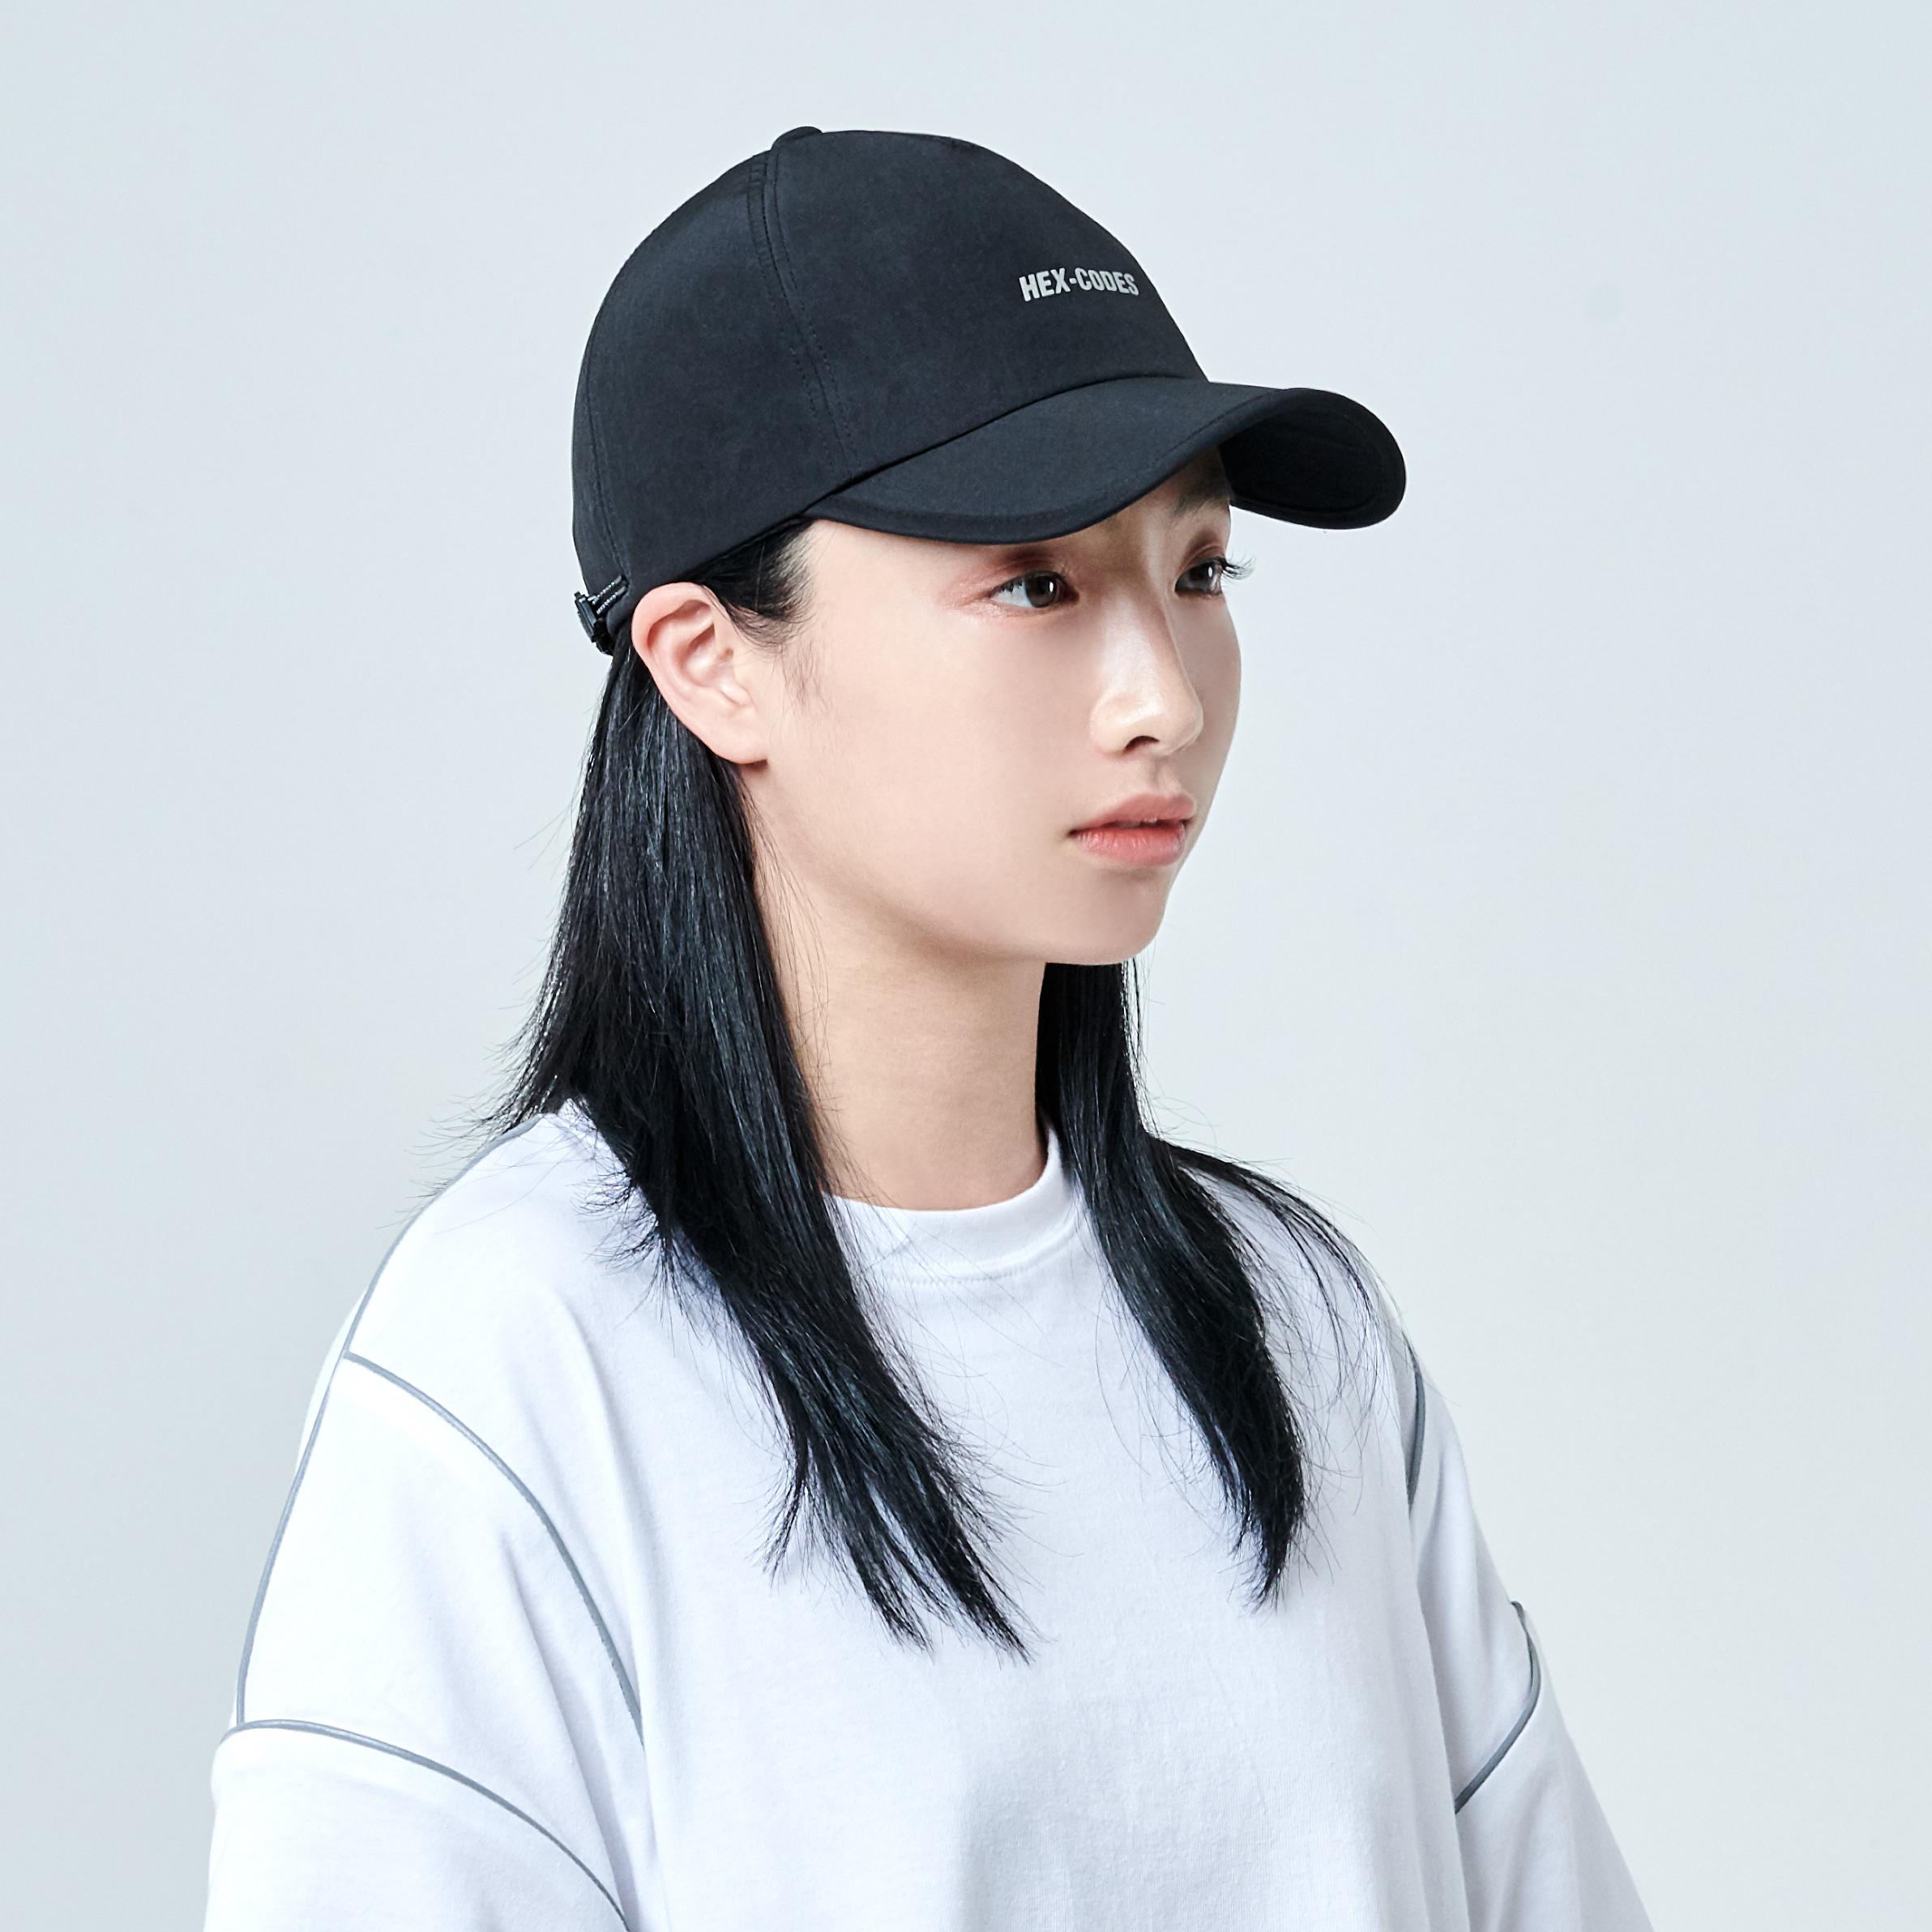 H04 펜타곤 프랙티컬 볼캡 모자 PENTAGON PRACTICAL CAP WITH 3M PRINTING BLACK